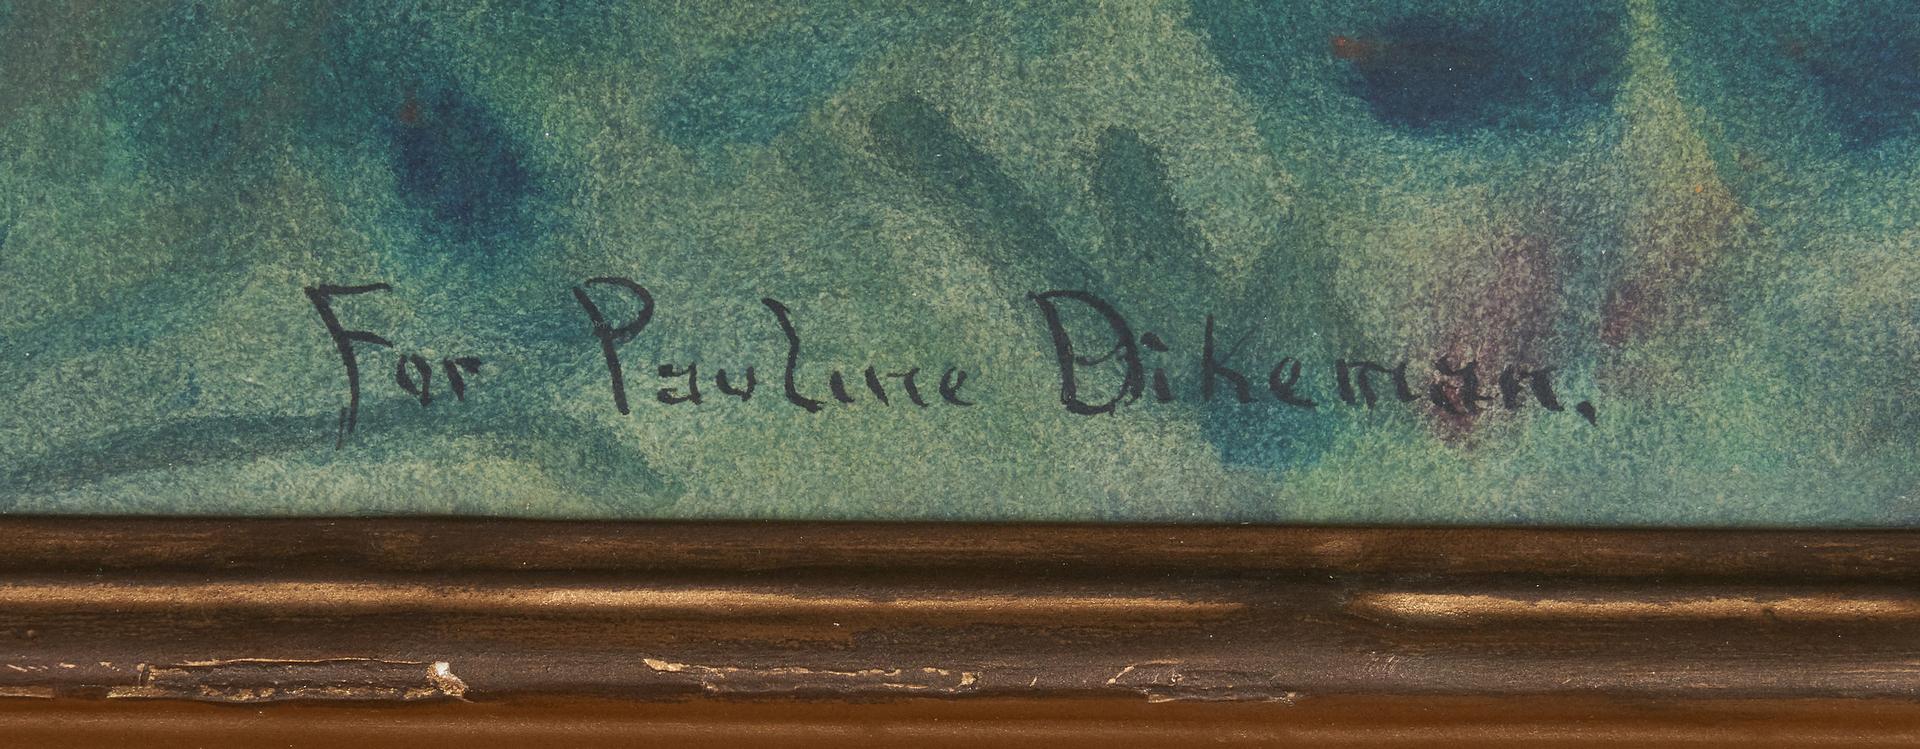 Lot 810: Robert Burns Wilson KY Landscape Watercolor